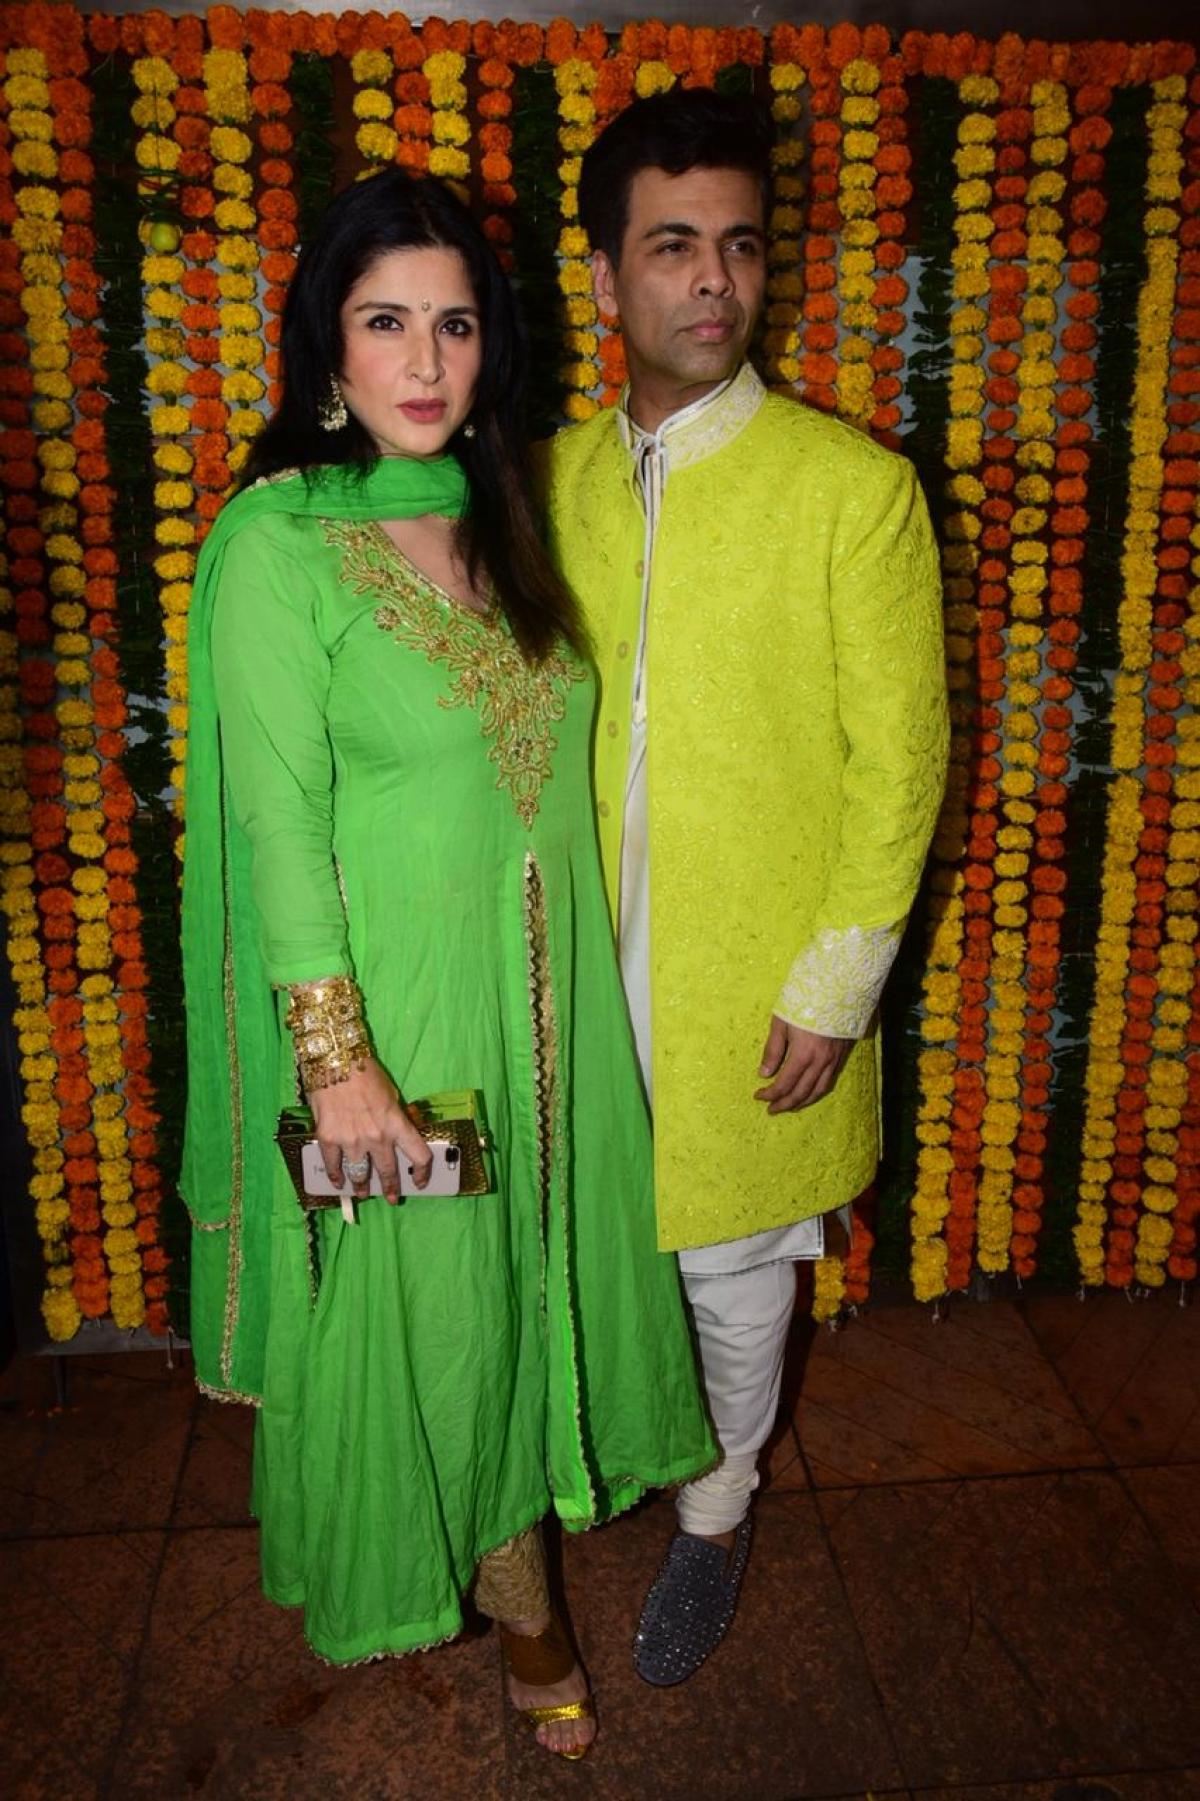 Karan Johar with a friend